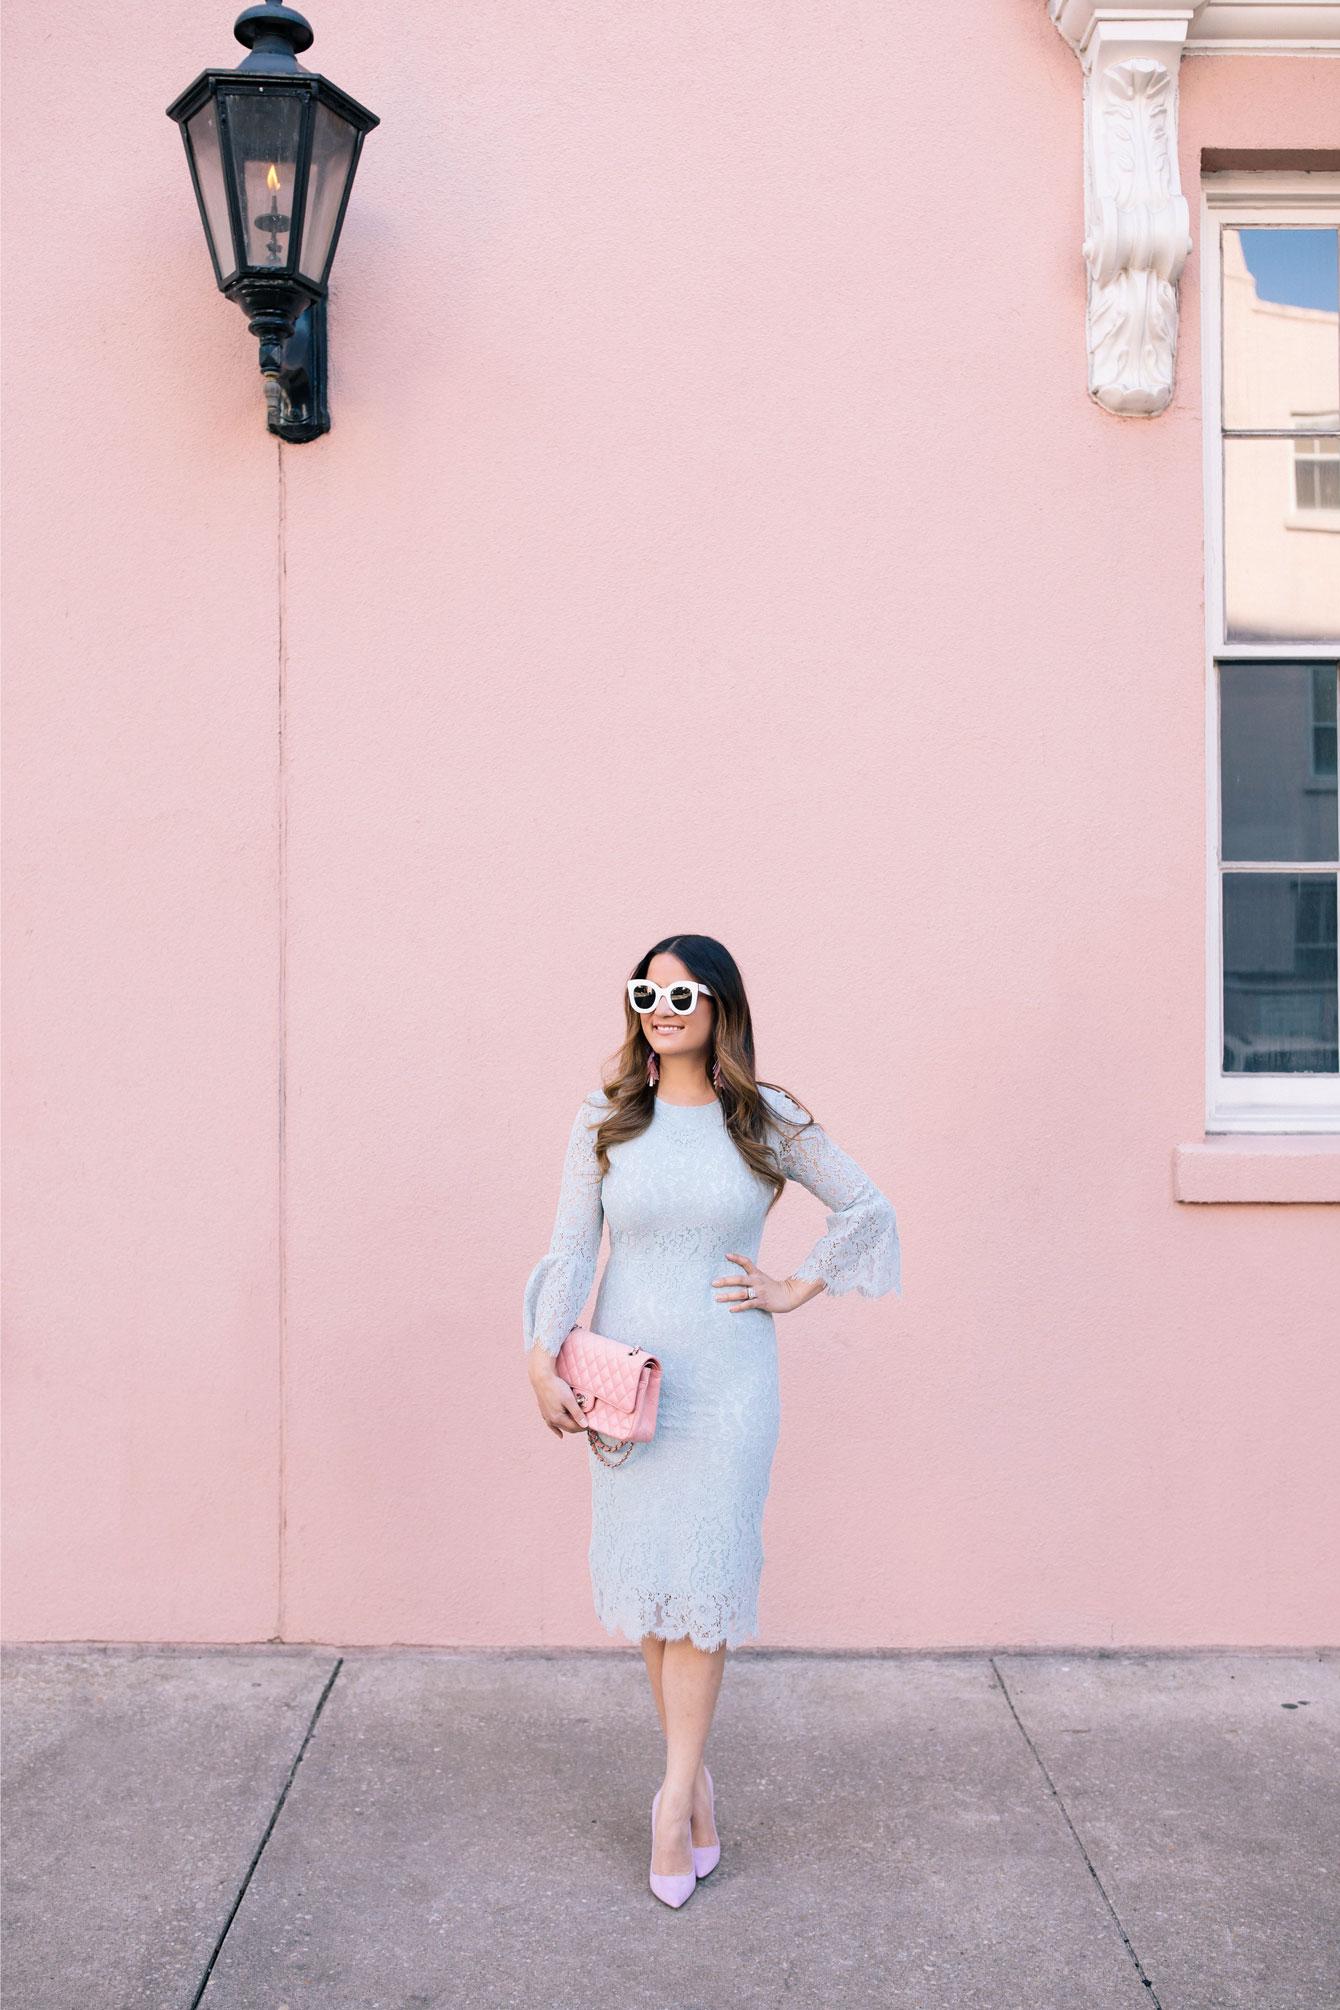 Charleston Pink Building